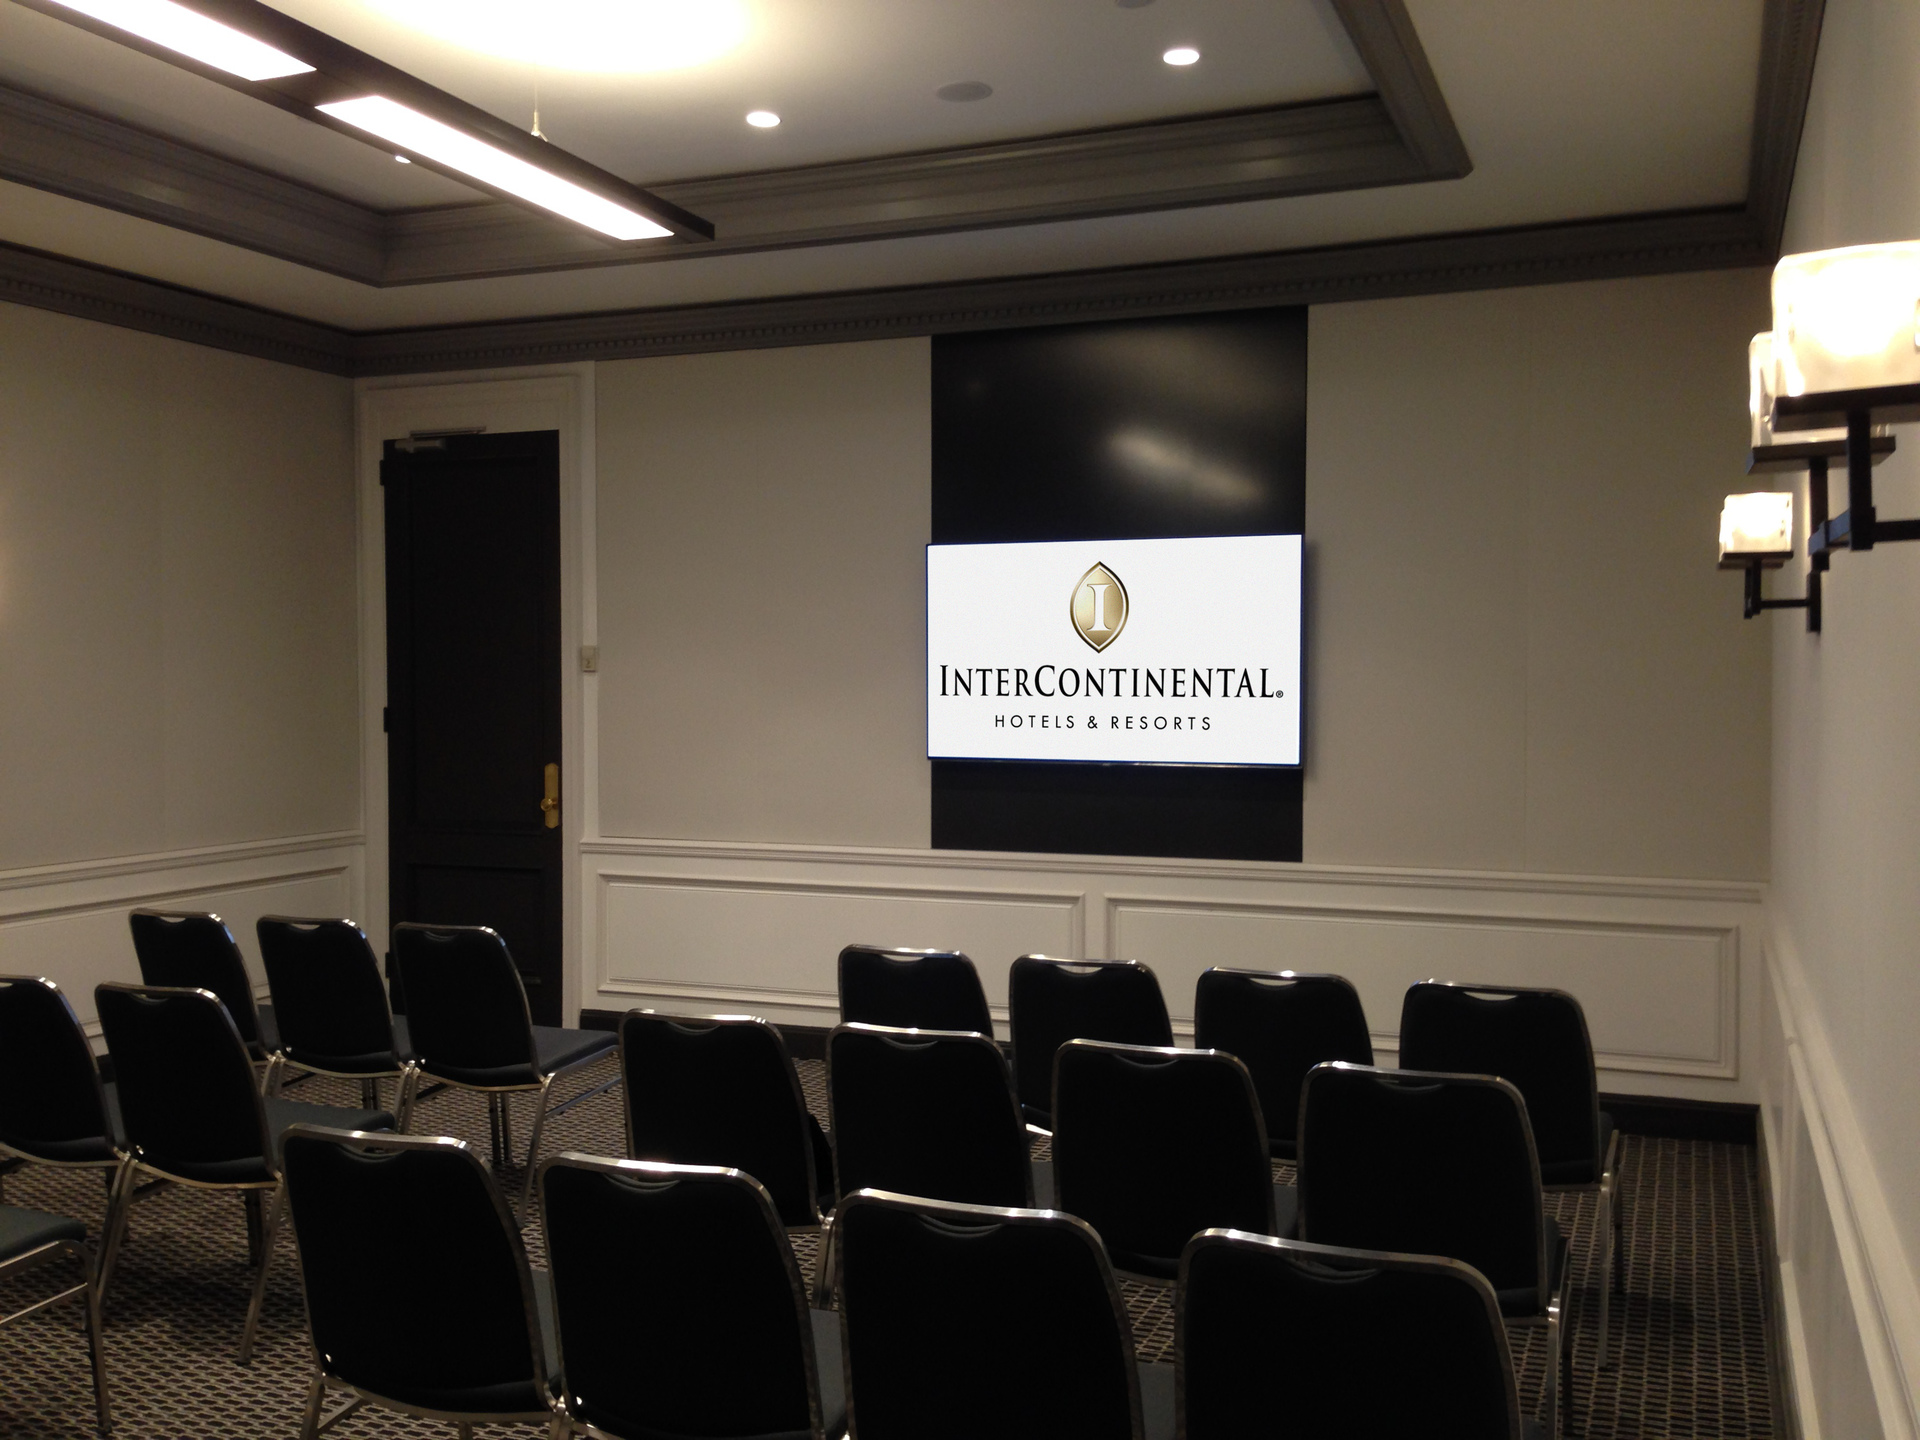 ICH 3 Meeting Room-3264x2448.jpg